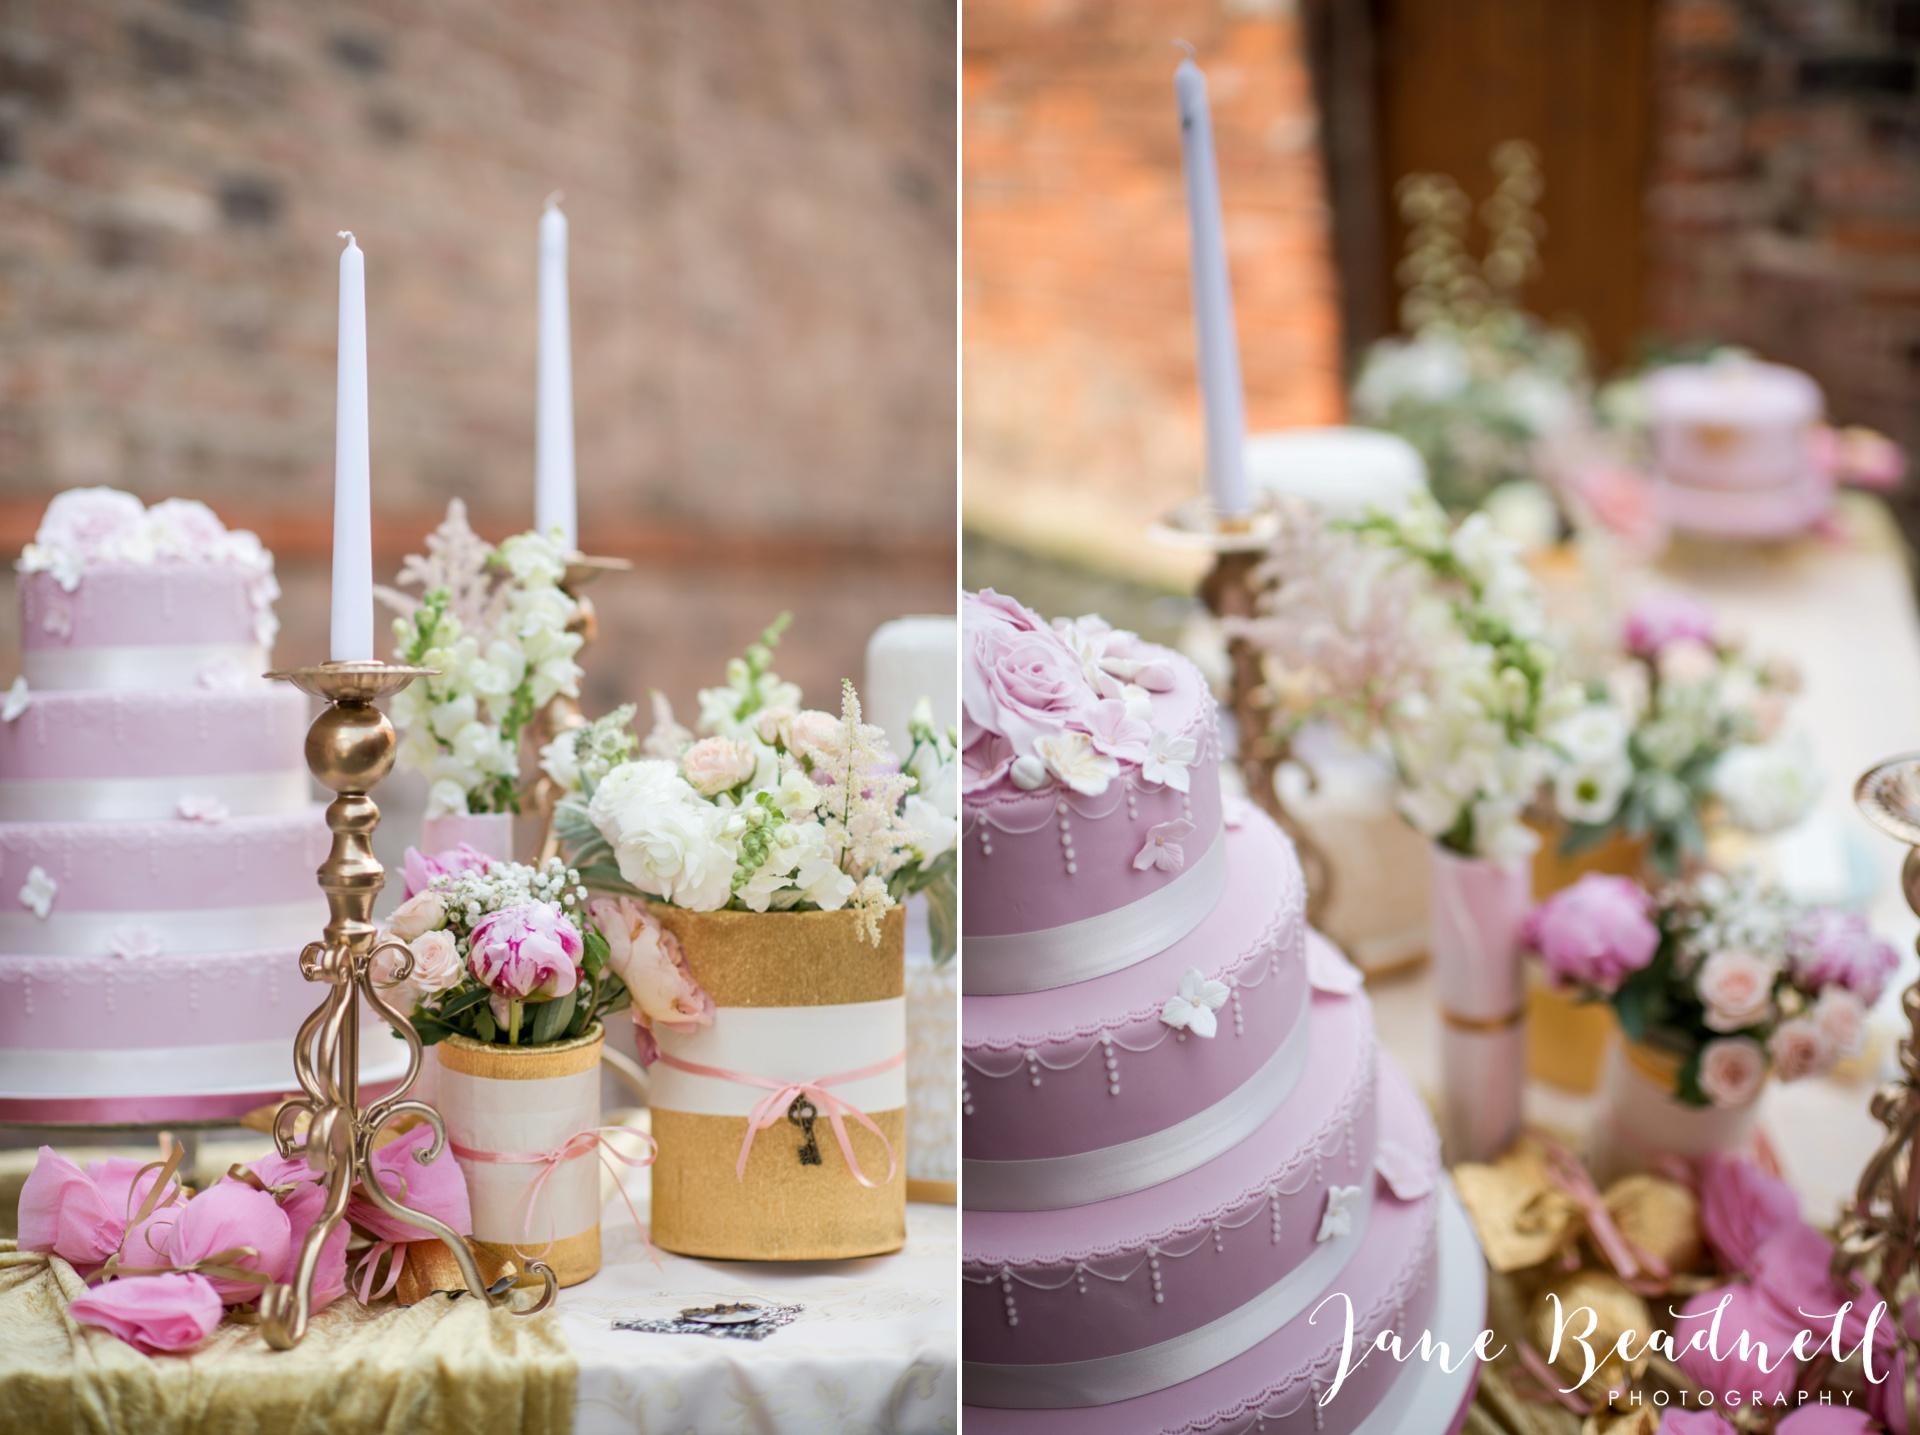 Jane Beadnell fine art wedding photographer York Bridal Photo Shoot_0007